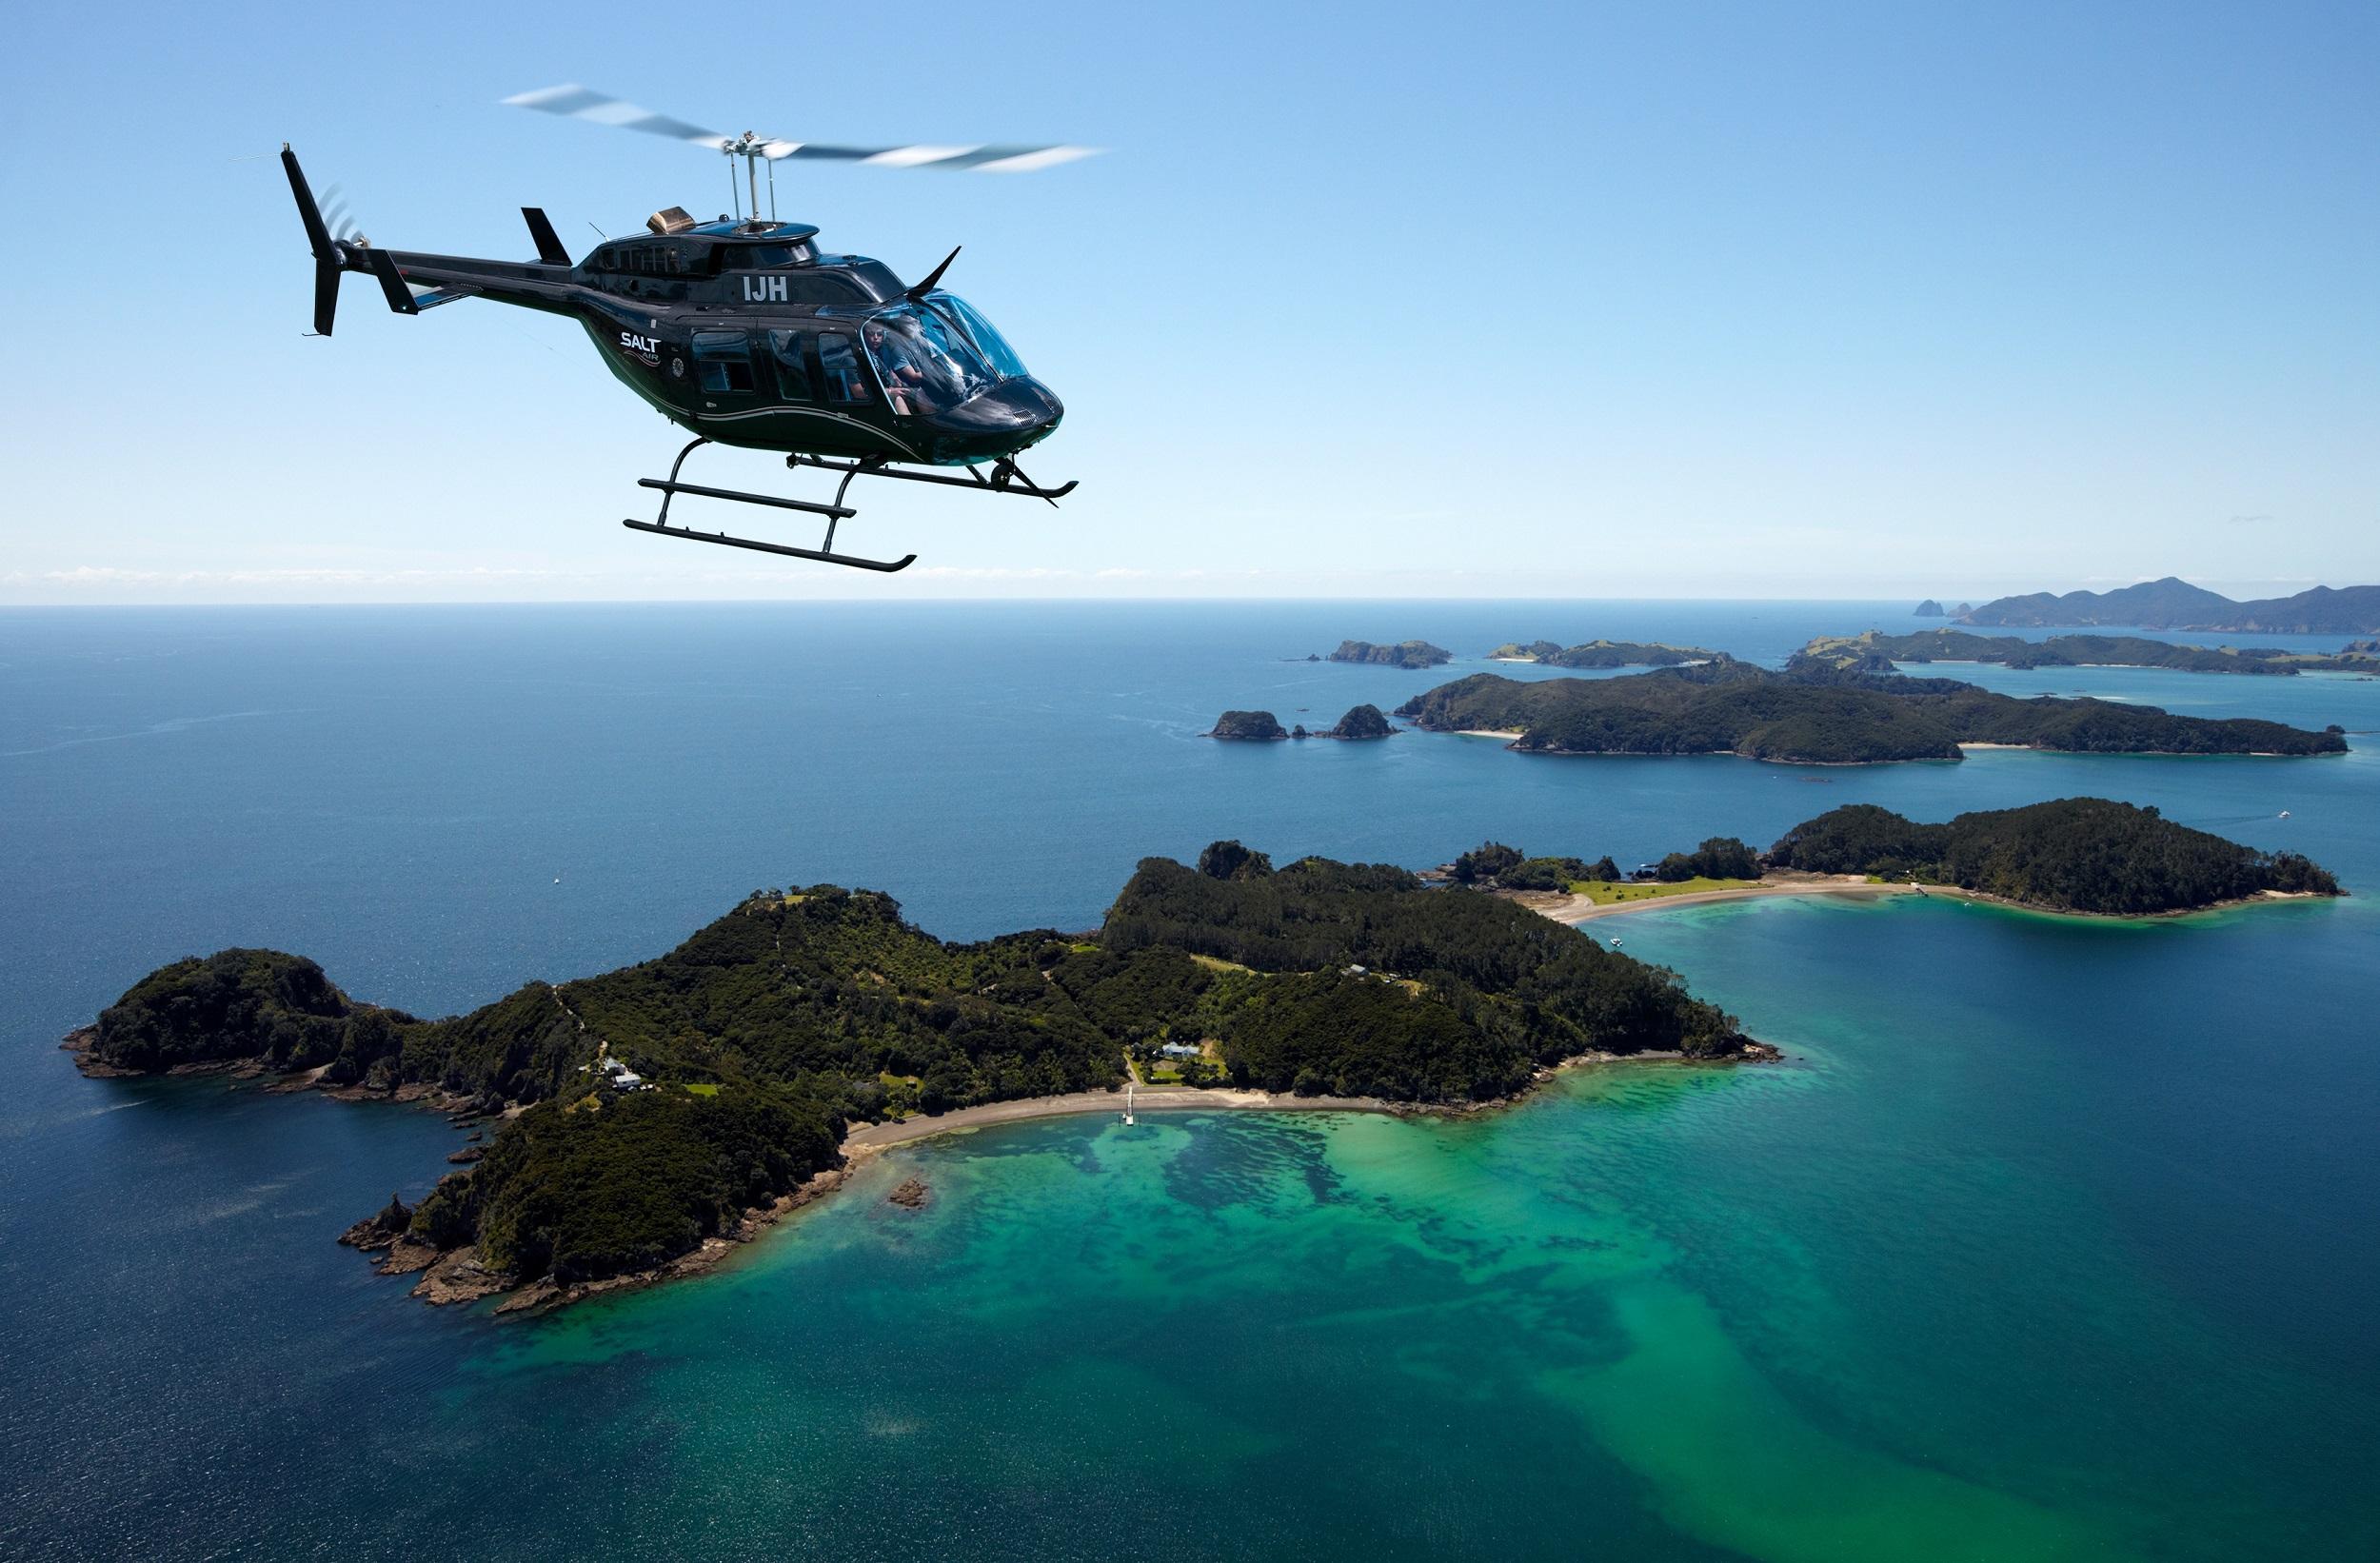 Salt Air Helicopter